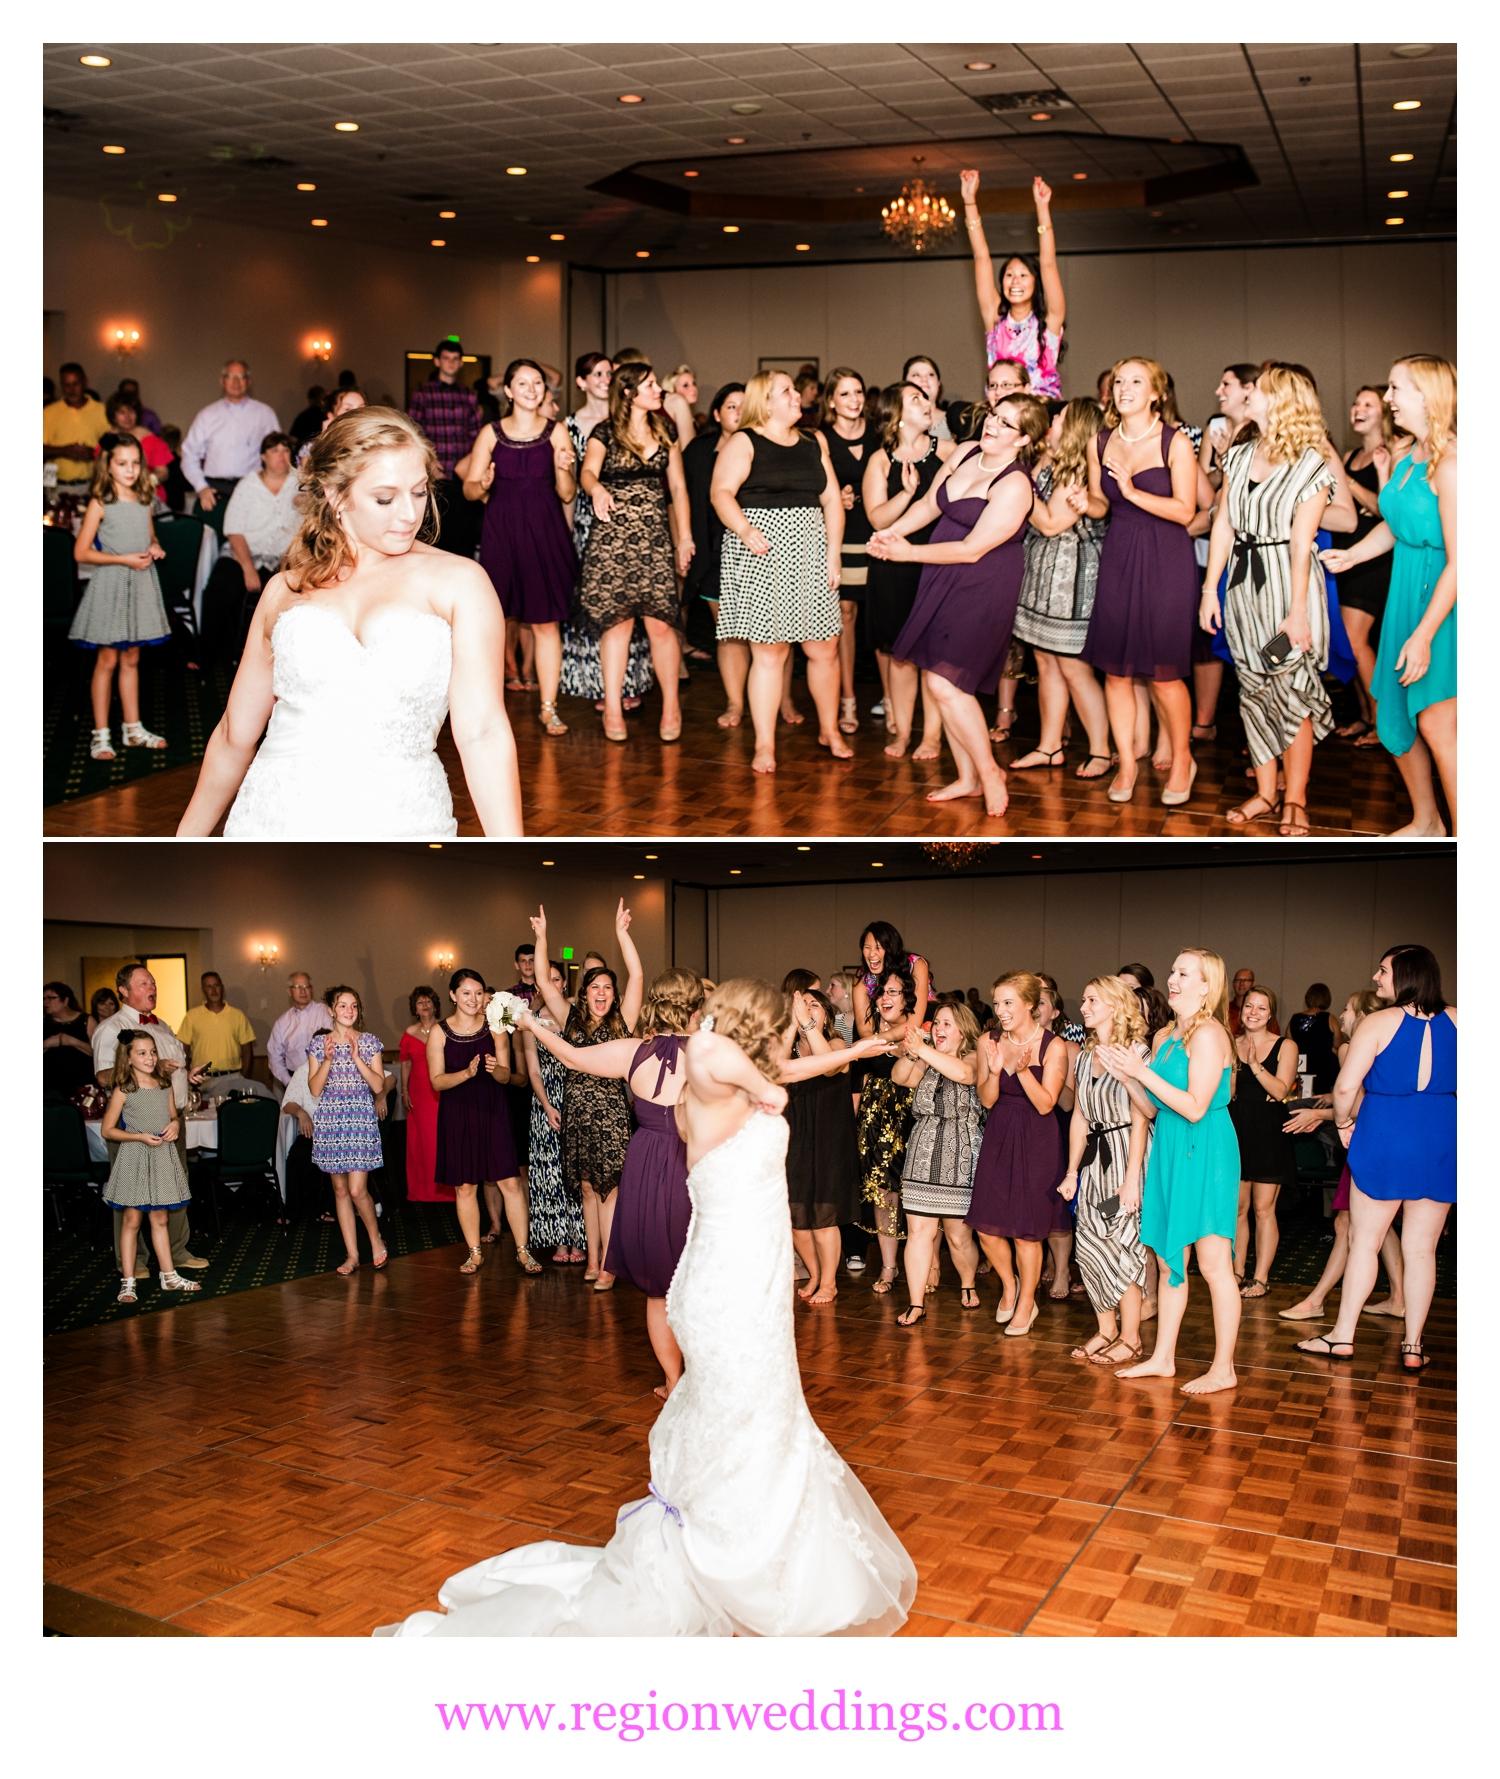 Bouquet toss at The Patrician Banquet Center.